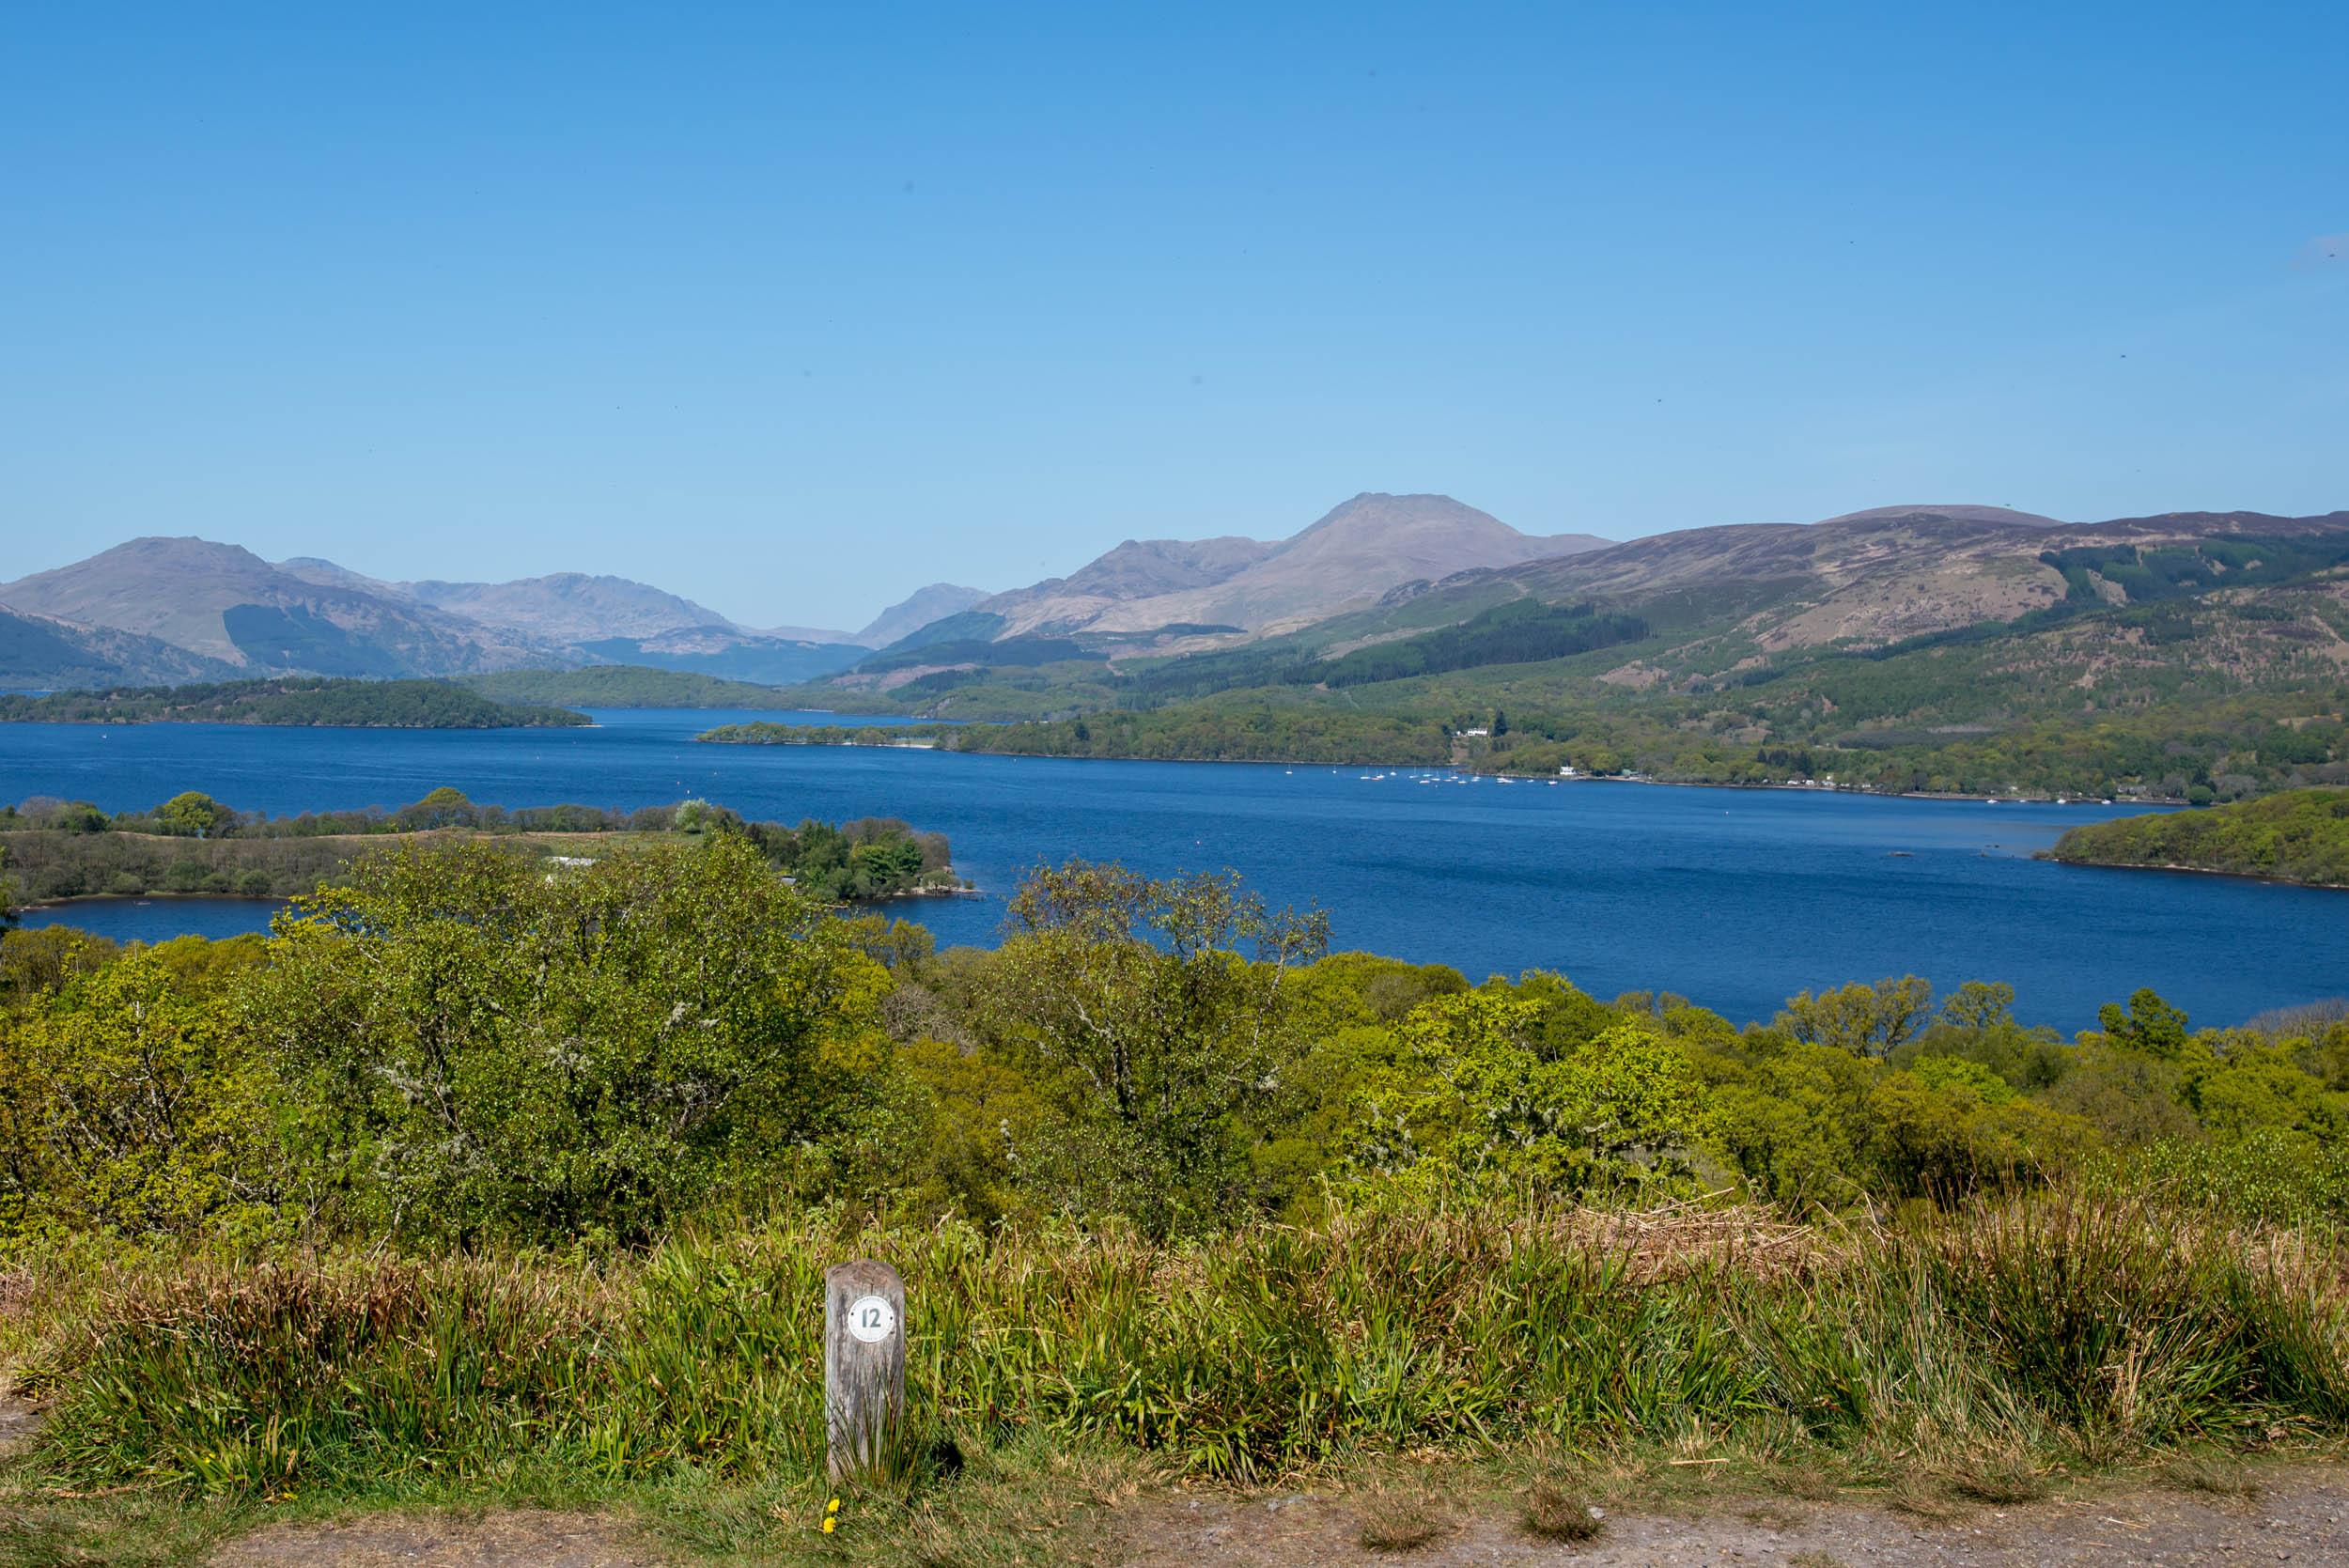 Inchcailloch Island, Loch Lomond